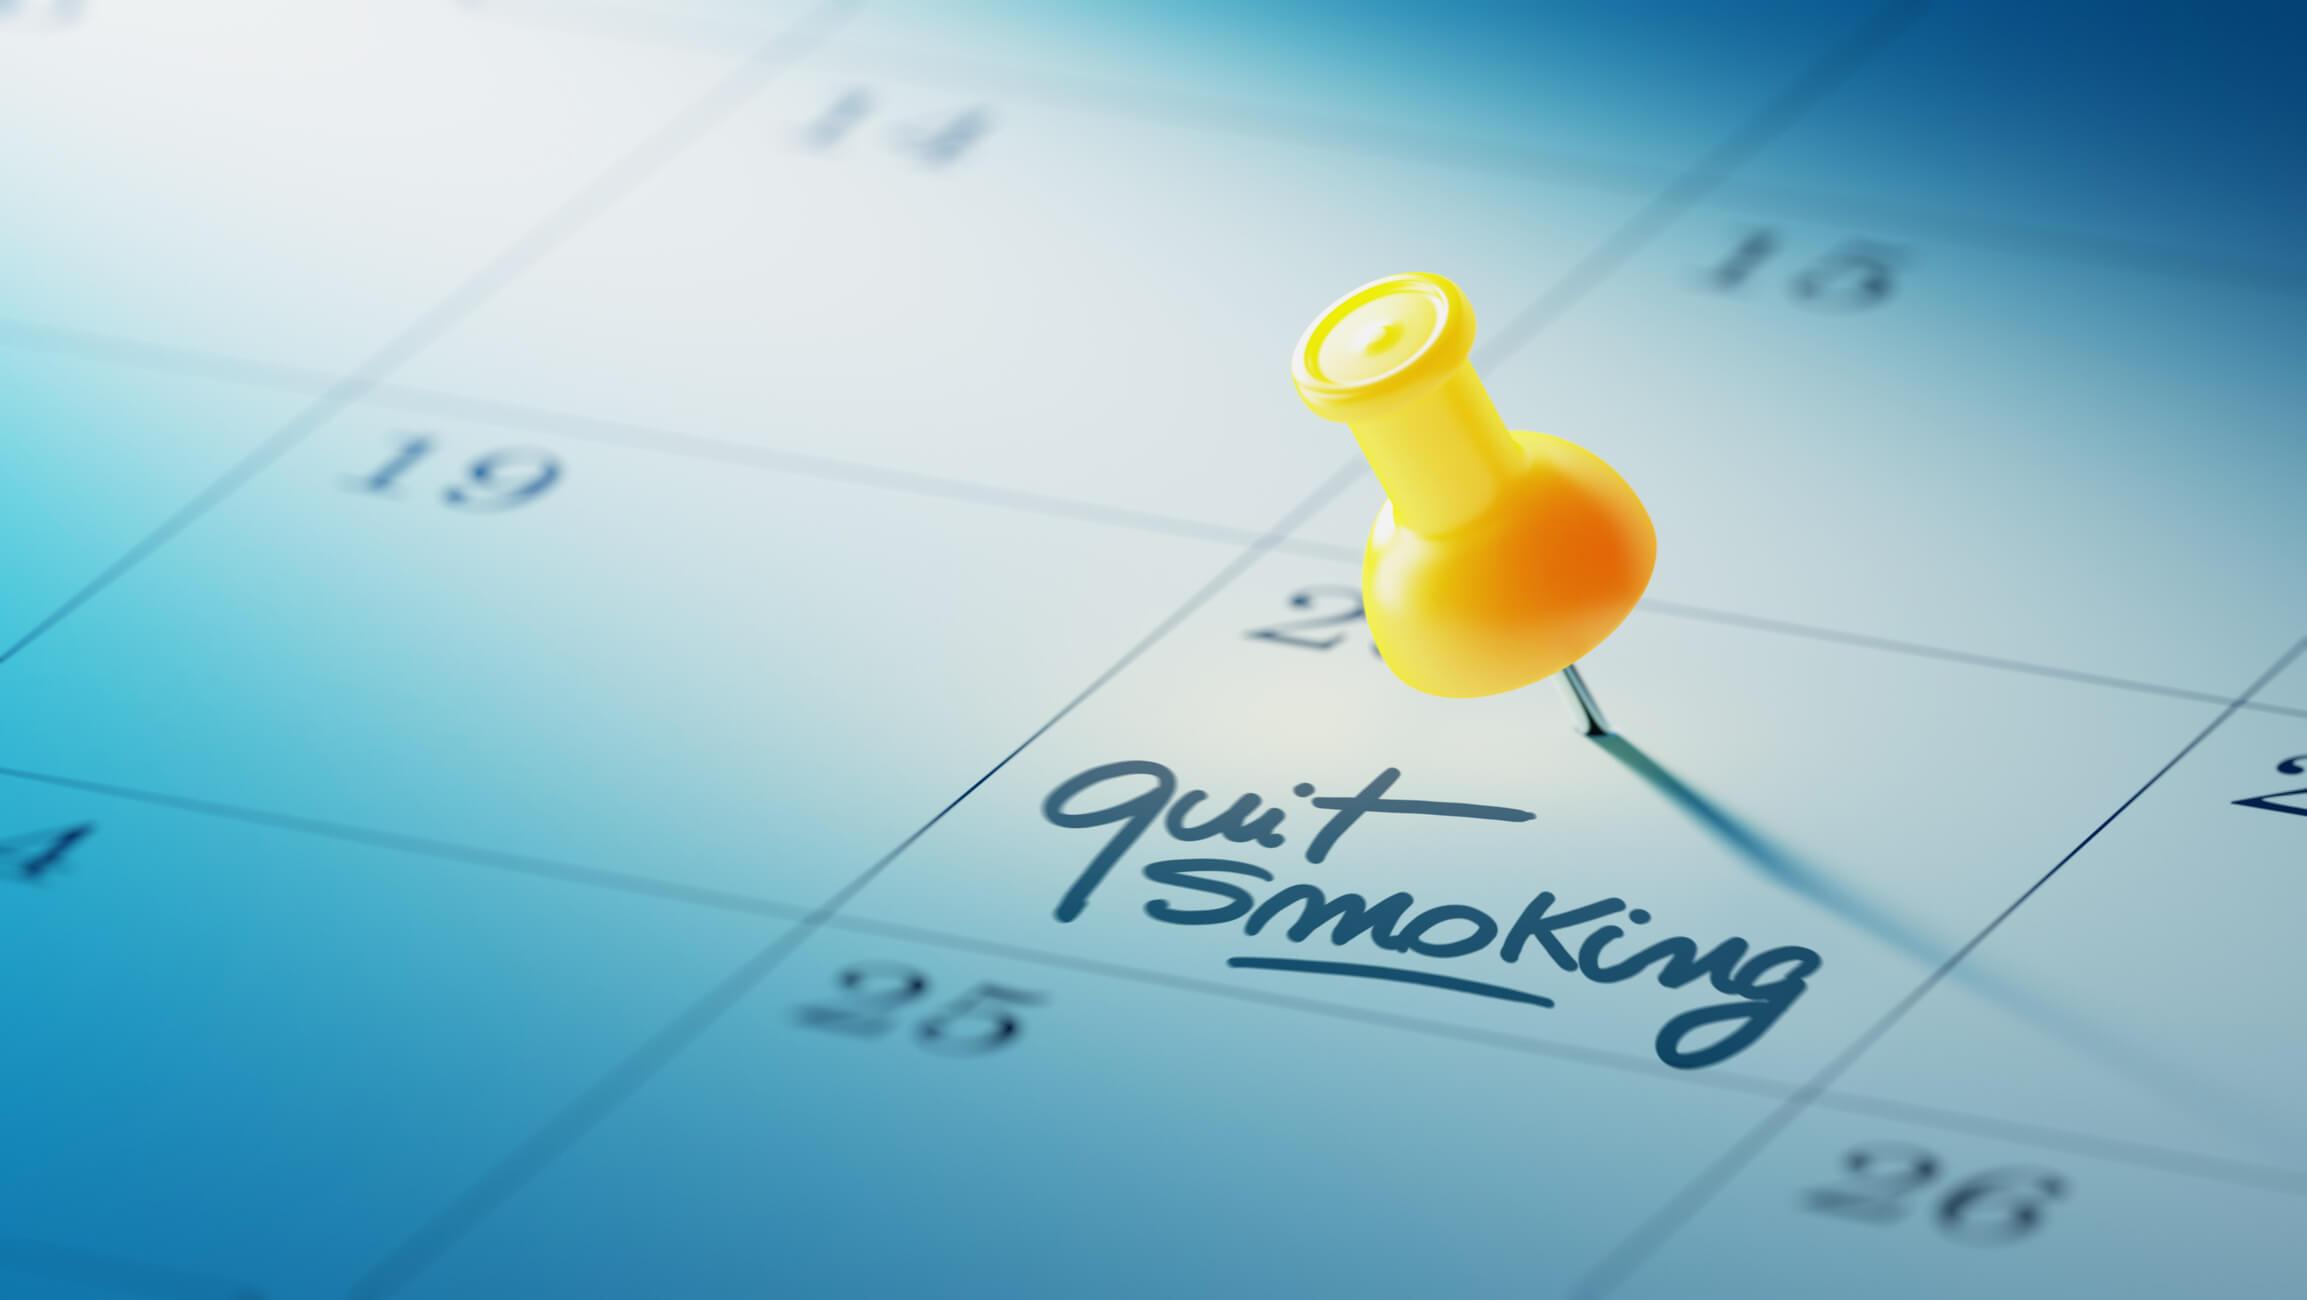 Quit smoking date on calendar